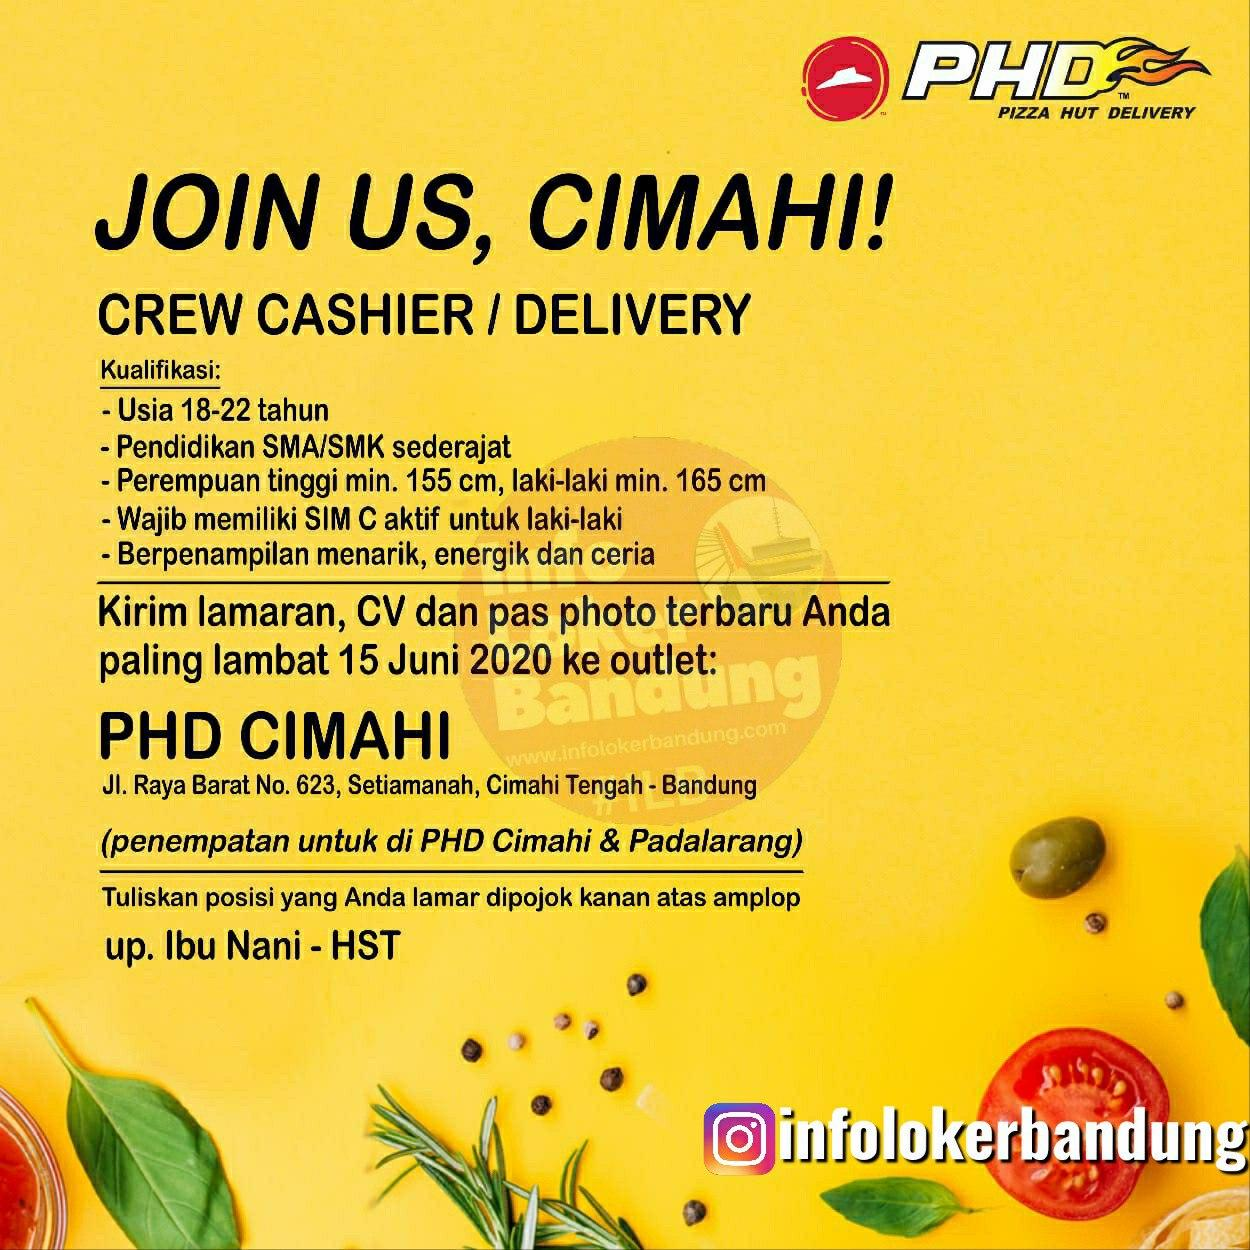 Lowongan Kerja Pizza Hut Delivery (PHD) Cimahi & Padalarang Juni 2020